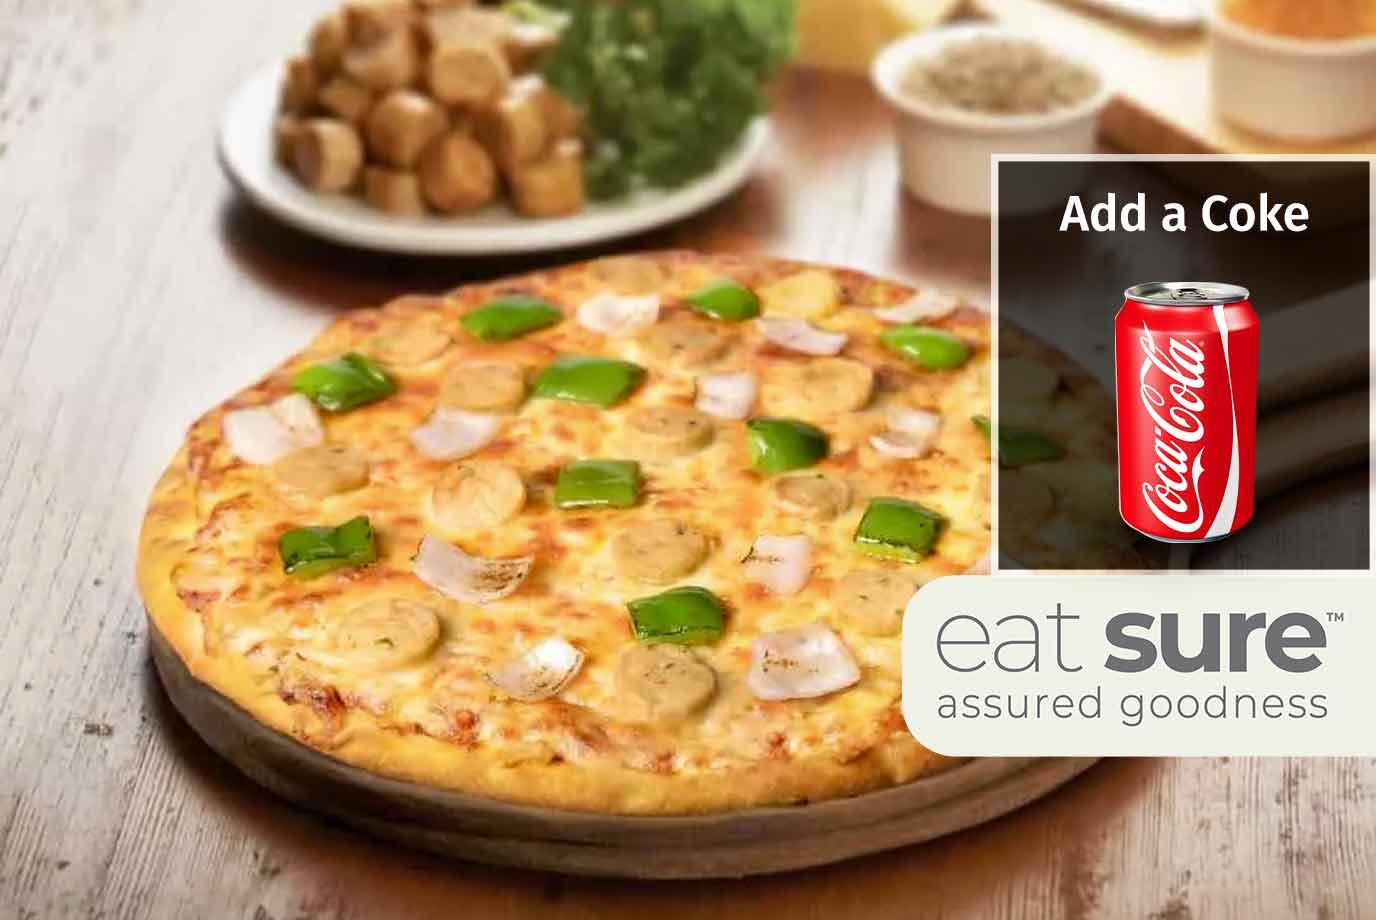 Smoked Chicken Sausage Pizza (11 Inch)